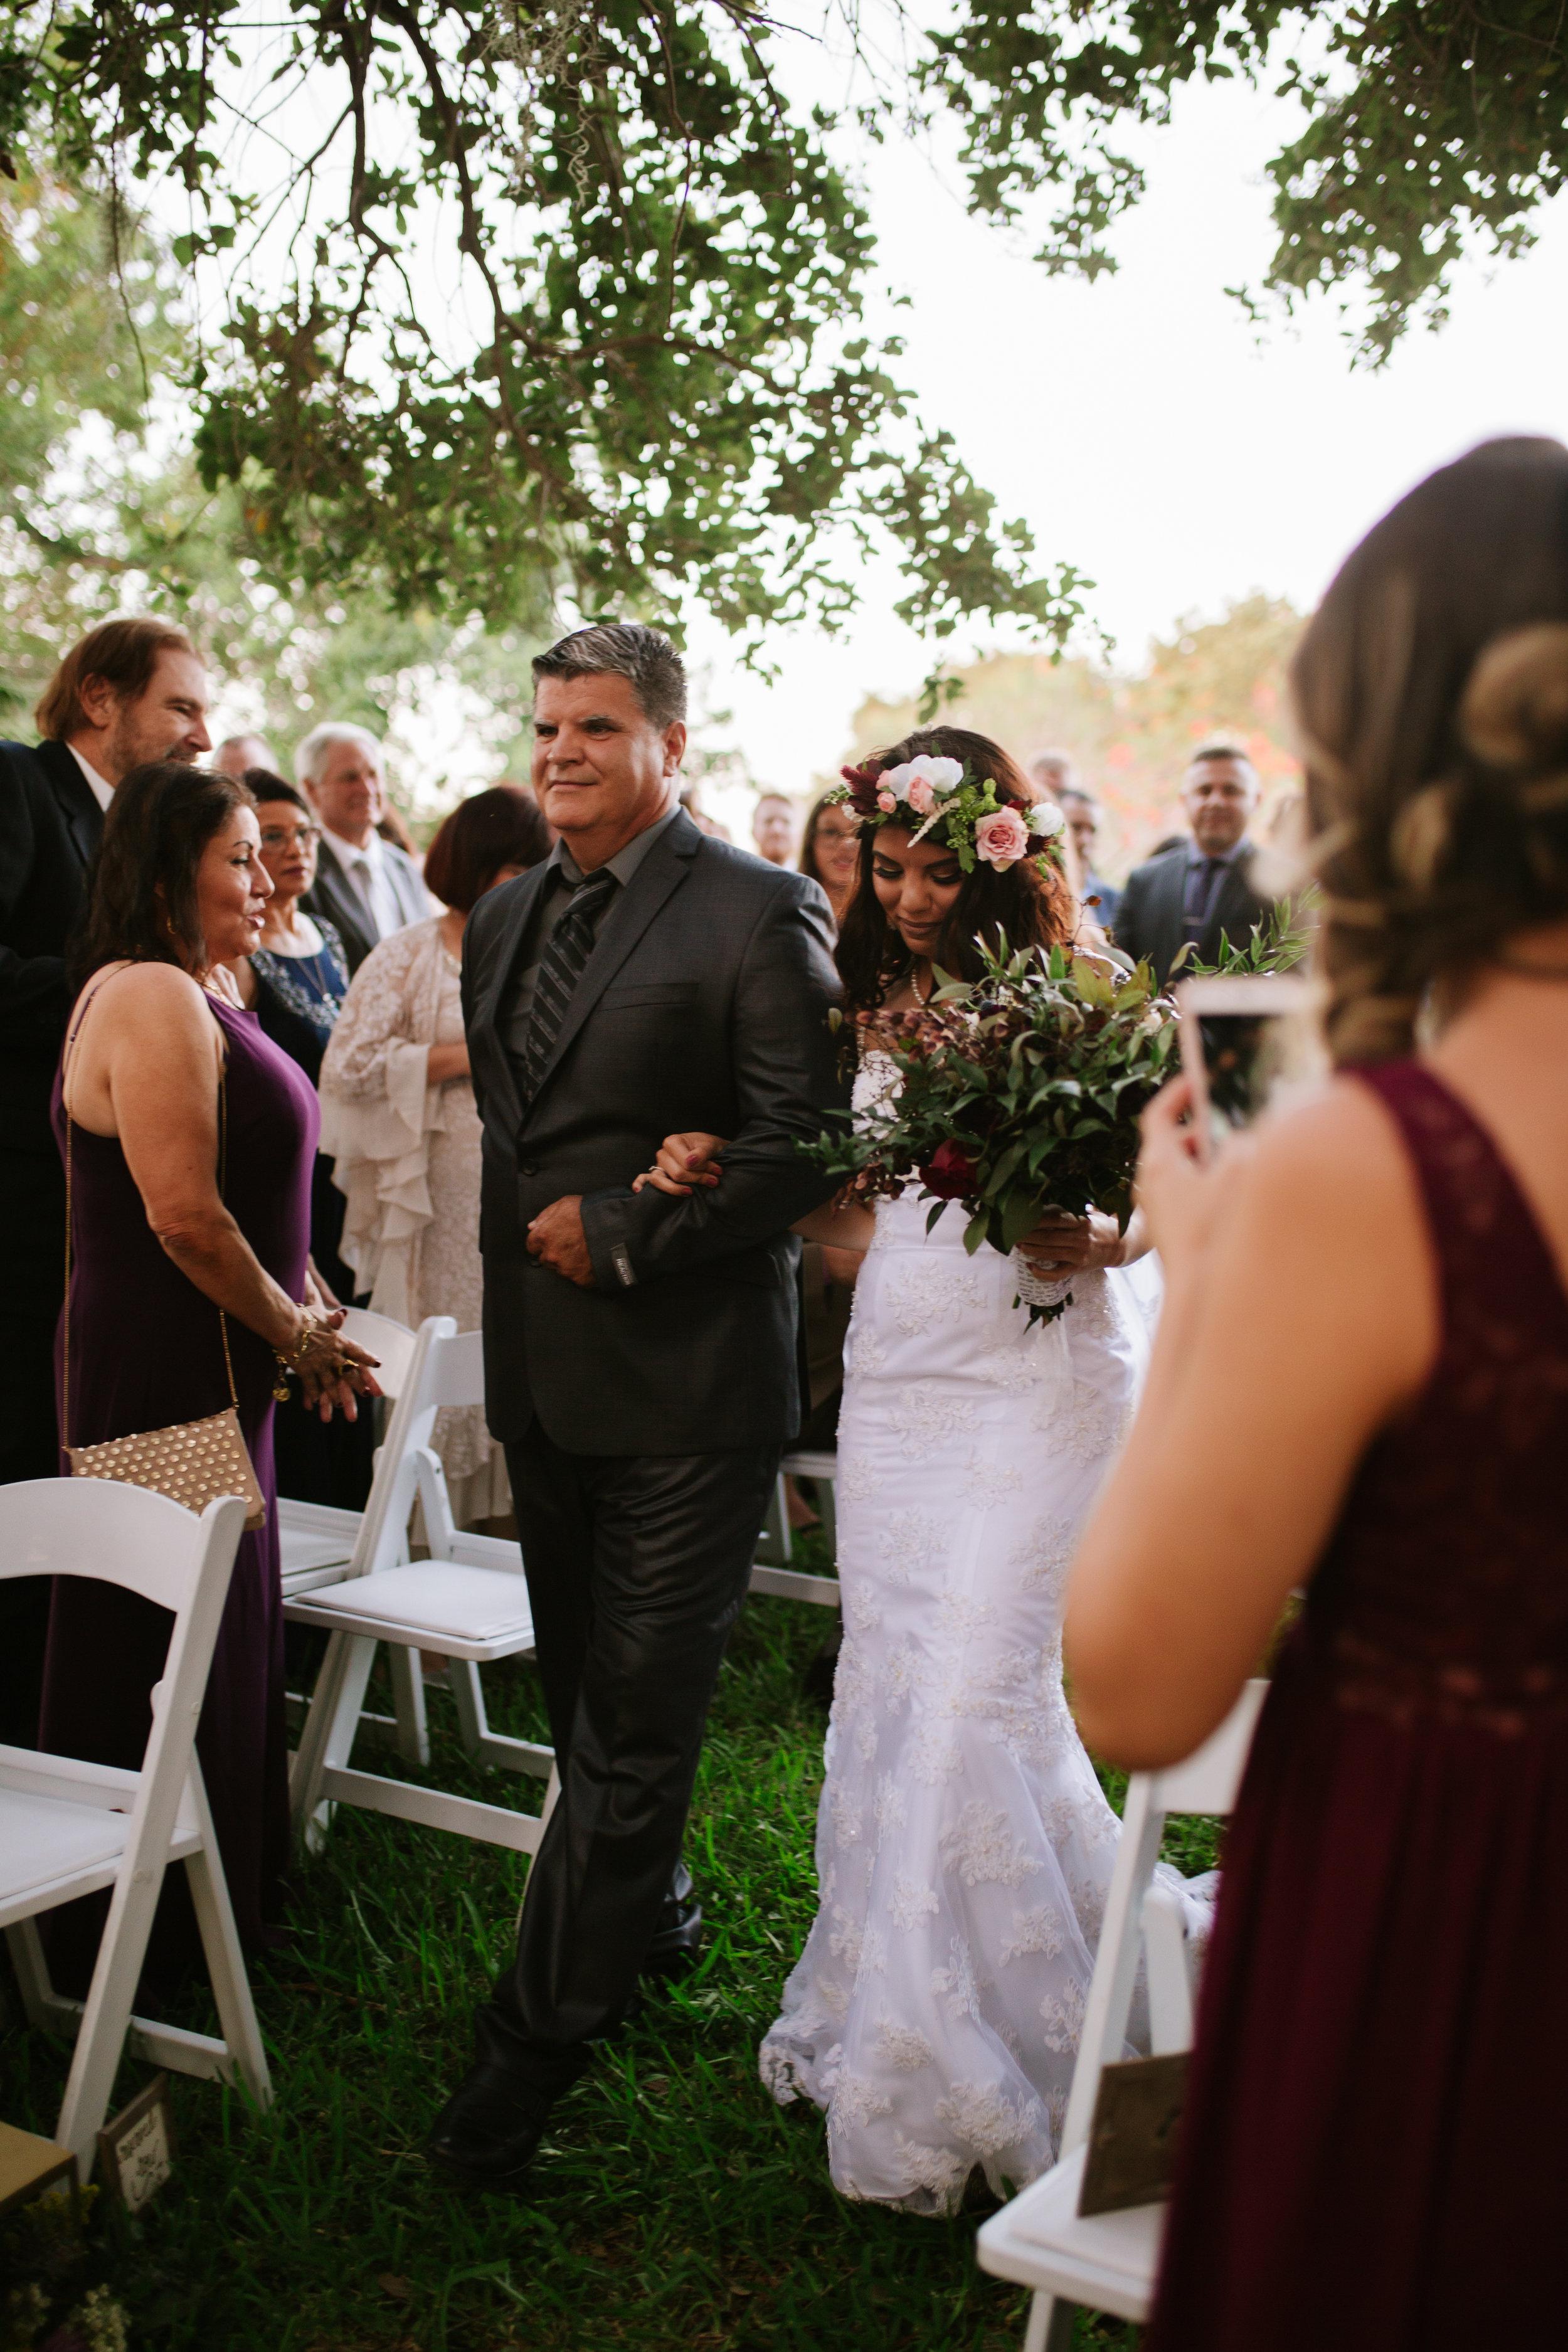 2017.05.23 Barbara and Mauricio Sales Port St Lucie Wedding (354 of 772).jpg